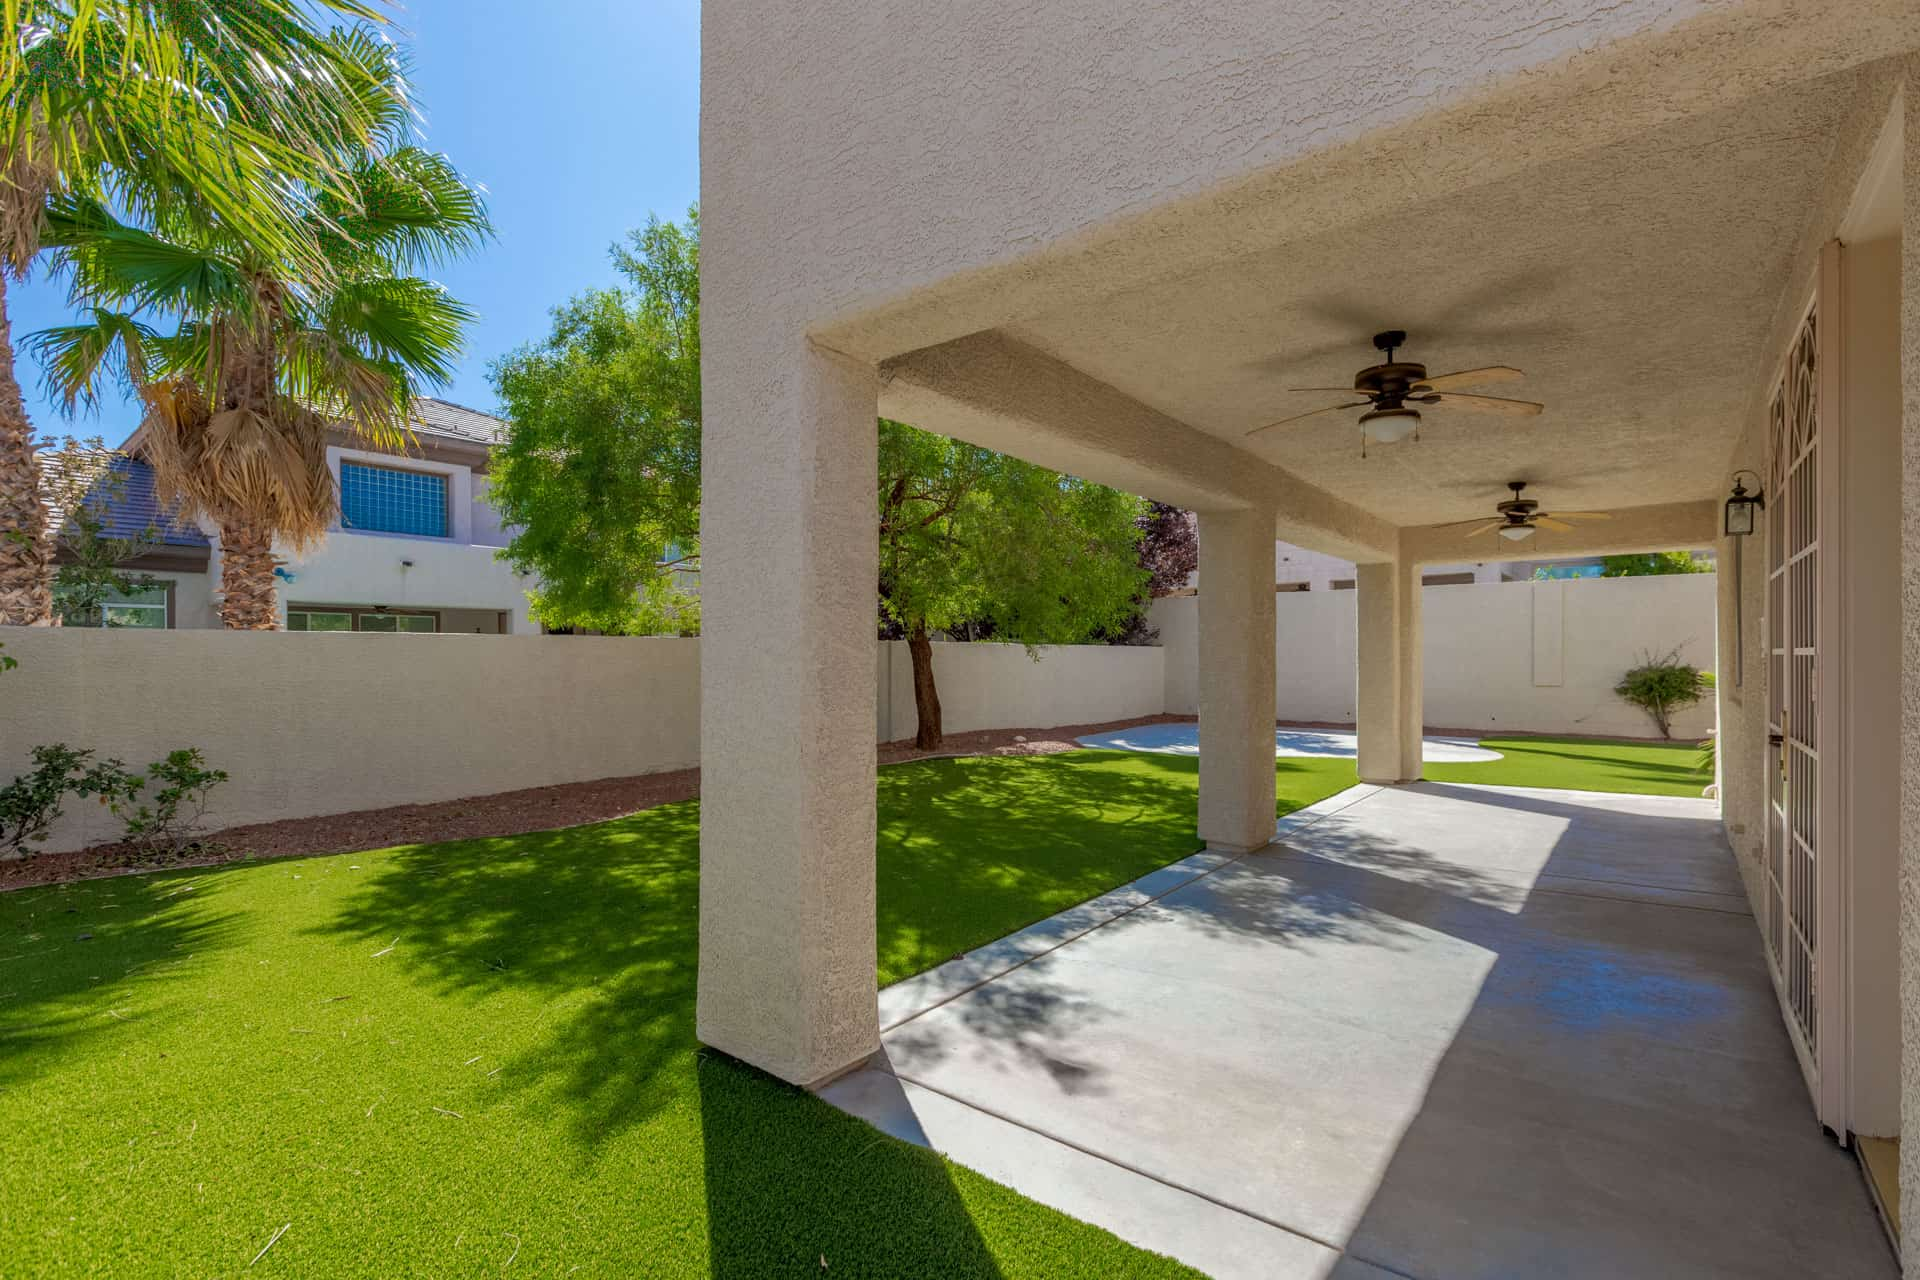 las-vegas-luxry-real-estate-realtor-rob-jensen-company-10729-grey-havens-court-willow-creek5057